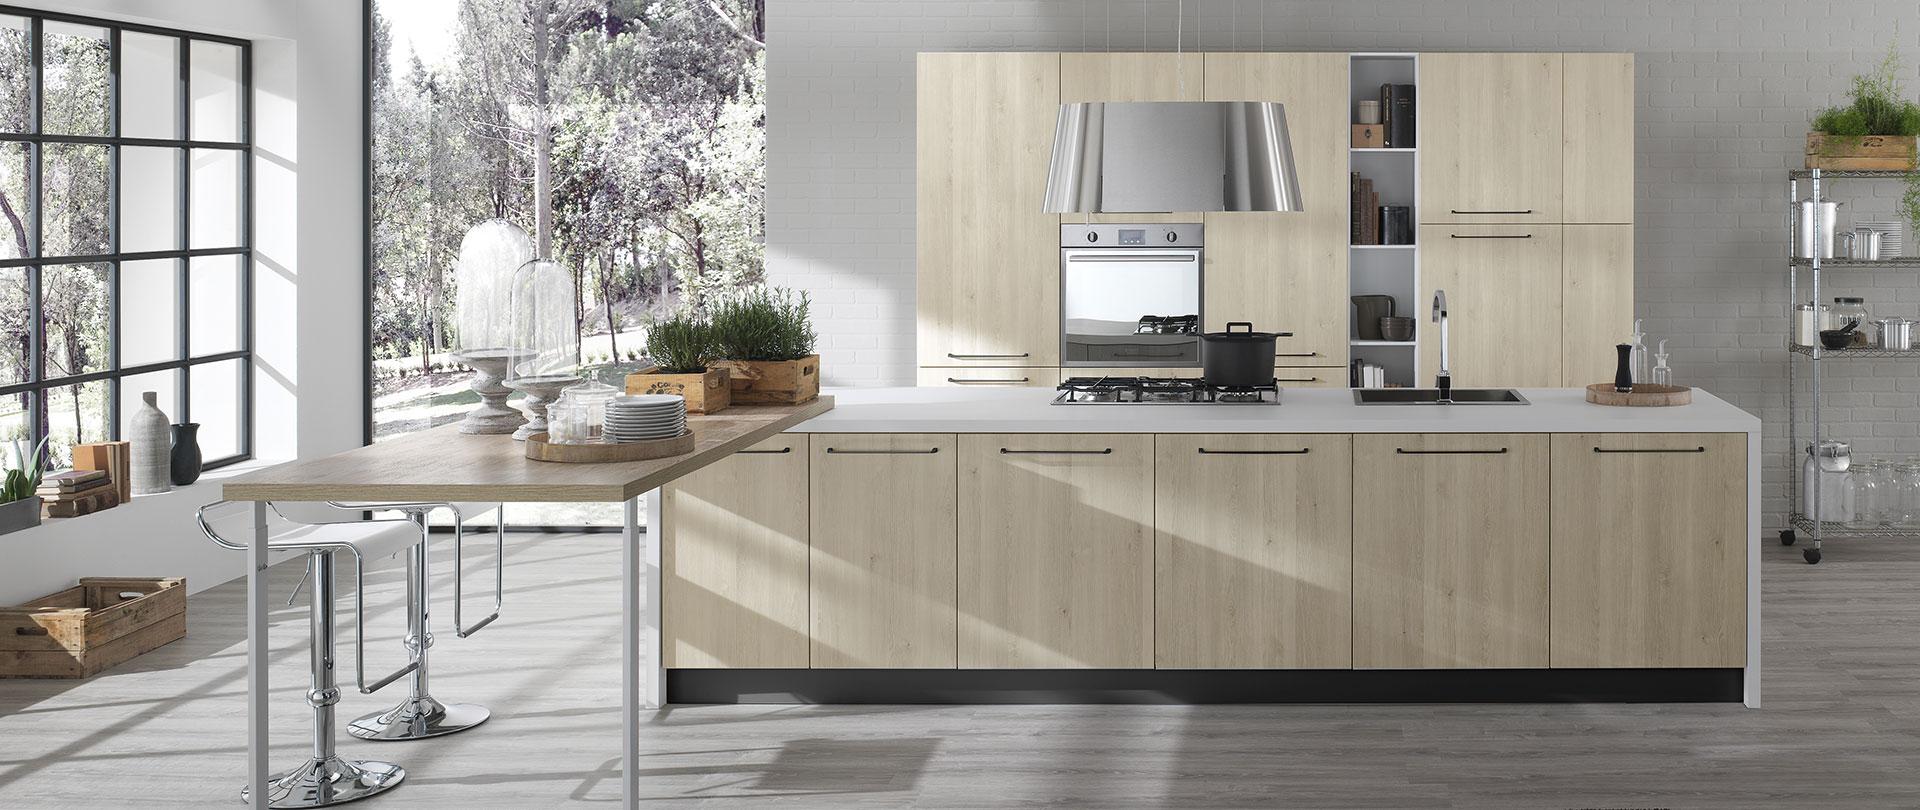 Cucine moderne color rovere | Aurora | EVO Cucine